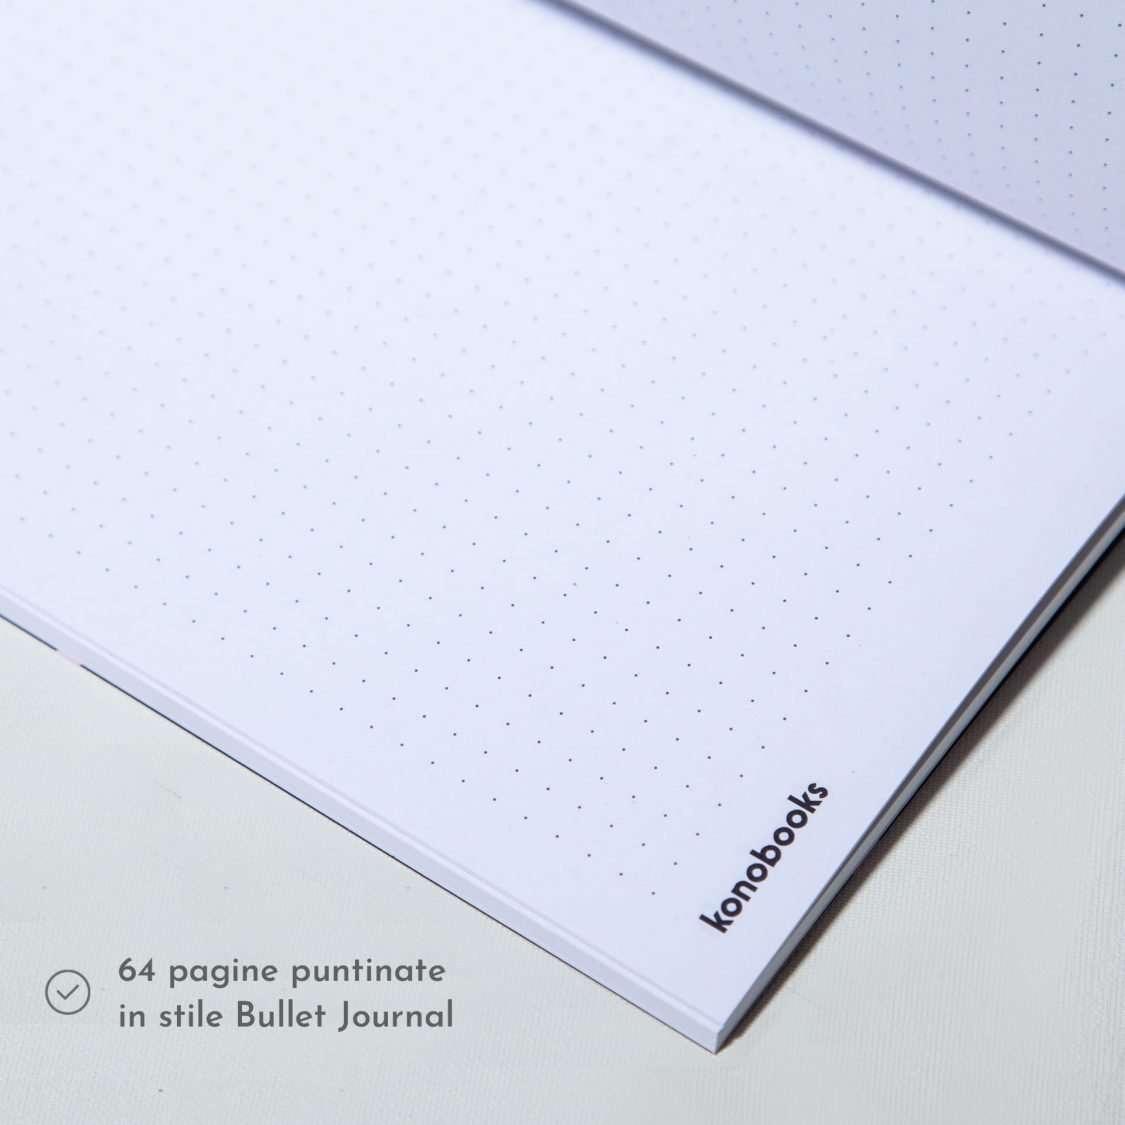 Quaderni puntinati bullet journal - Konobooks